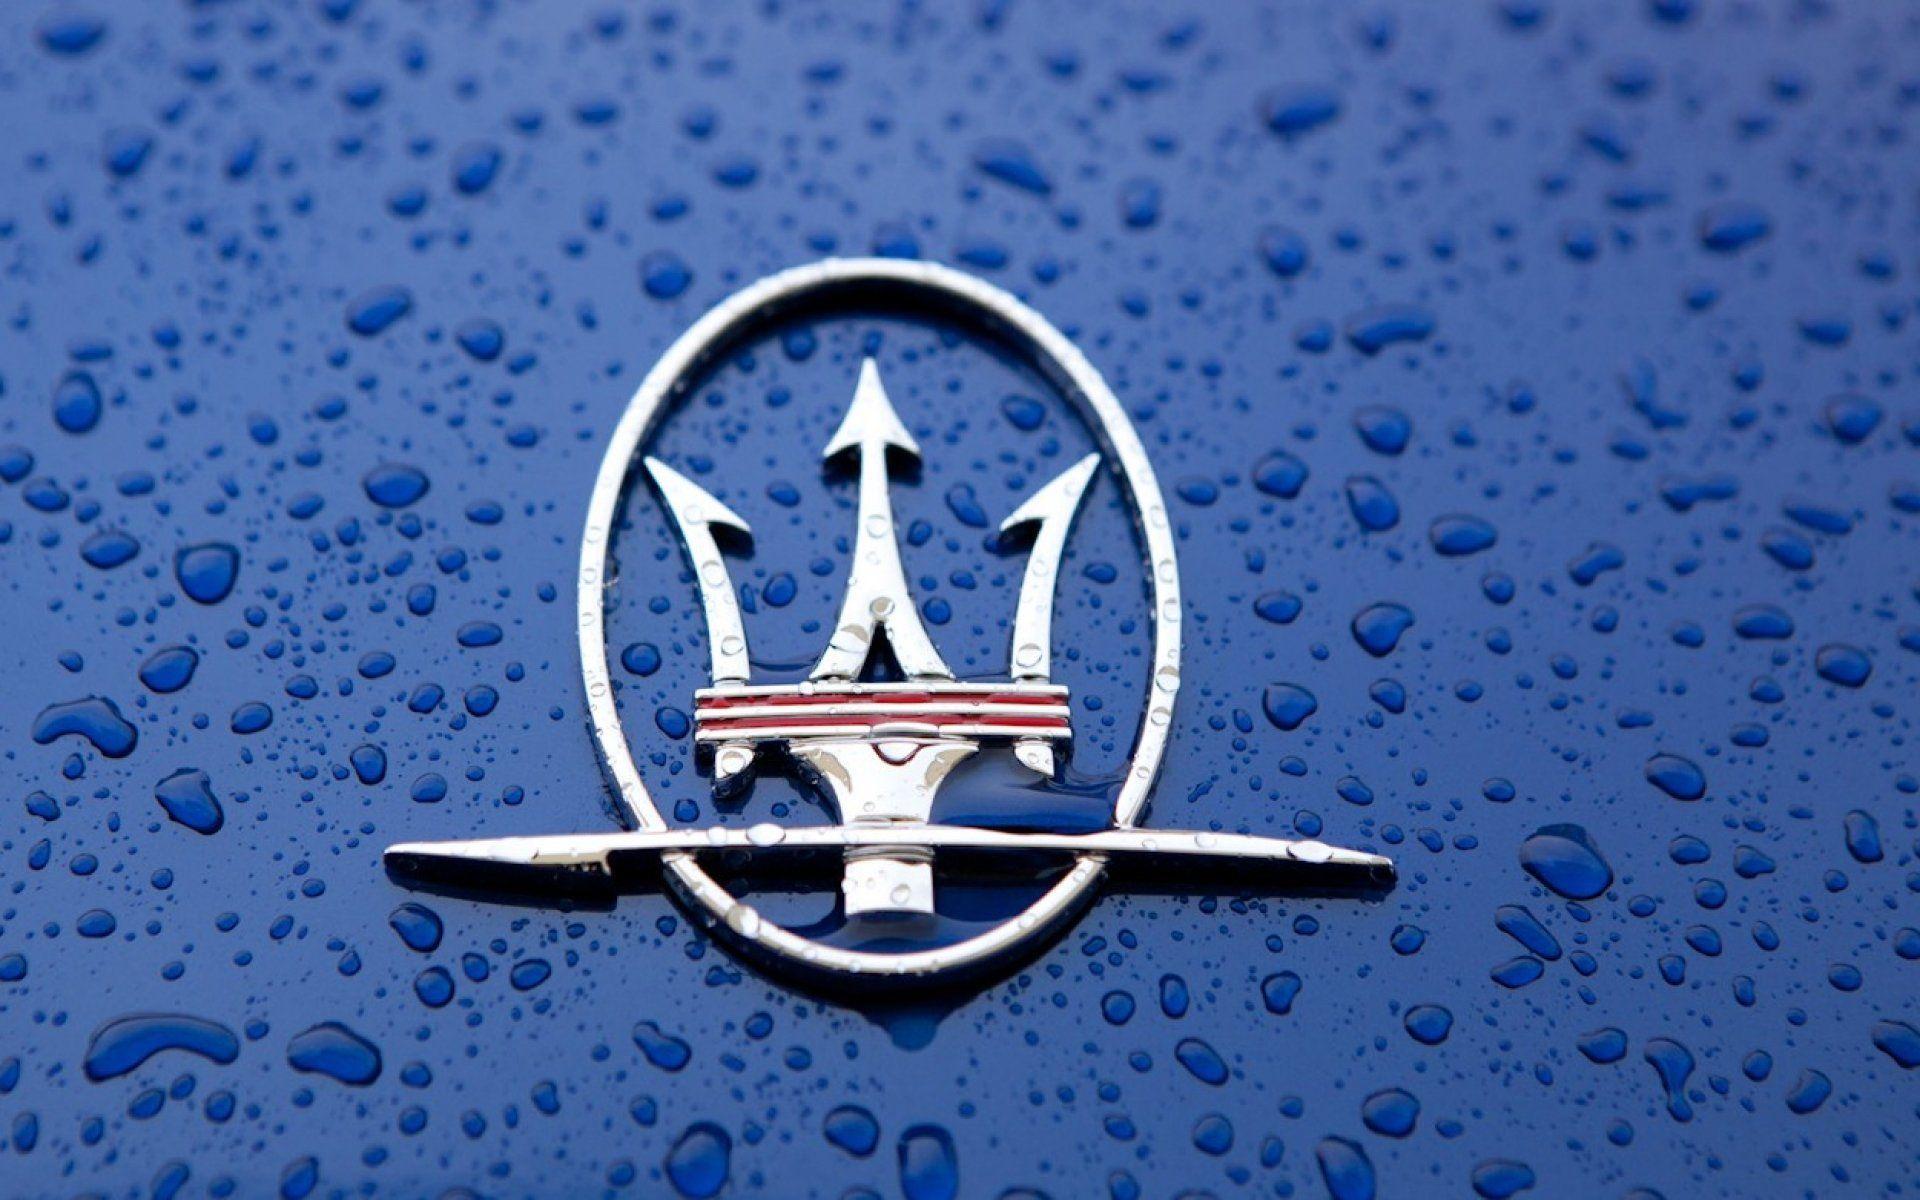 Maserati Car Logo HD Wallpapers   Top Maserati Car Logo HD 1920x1200